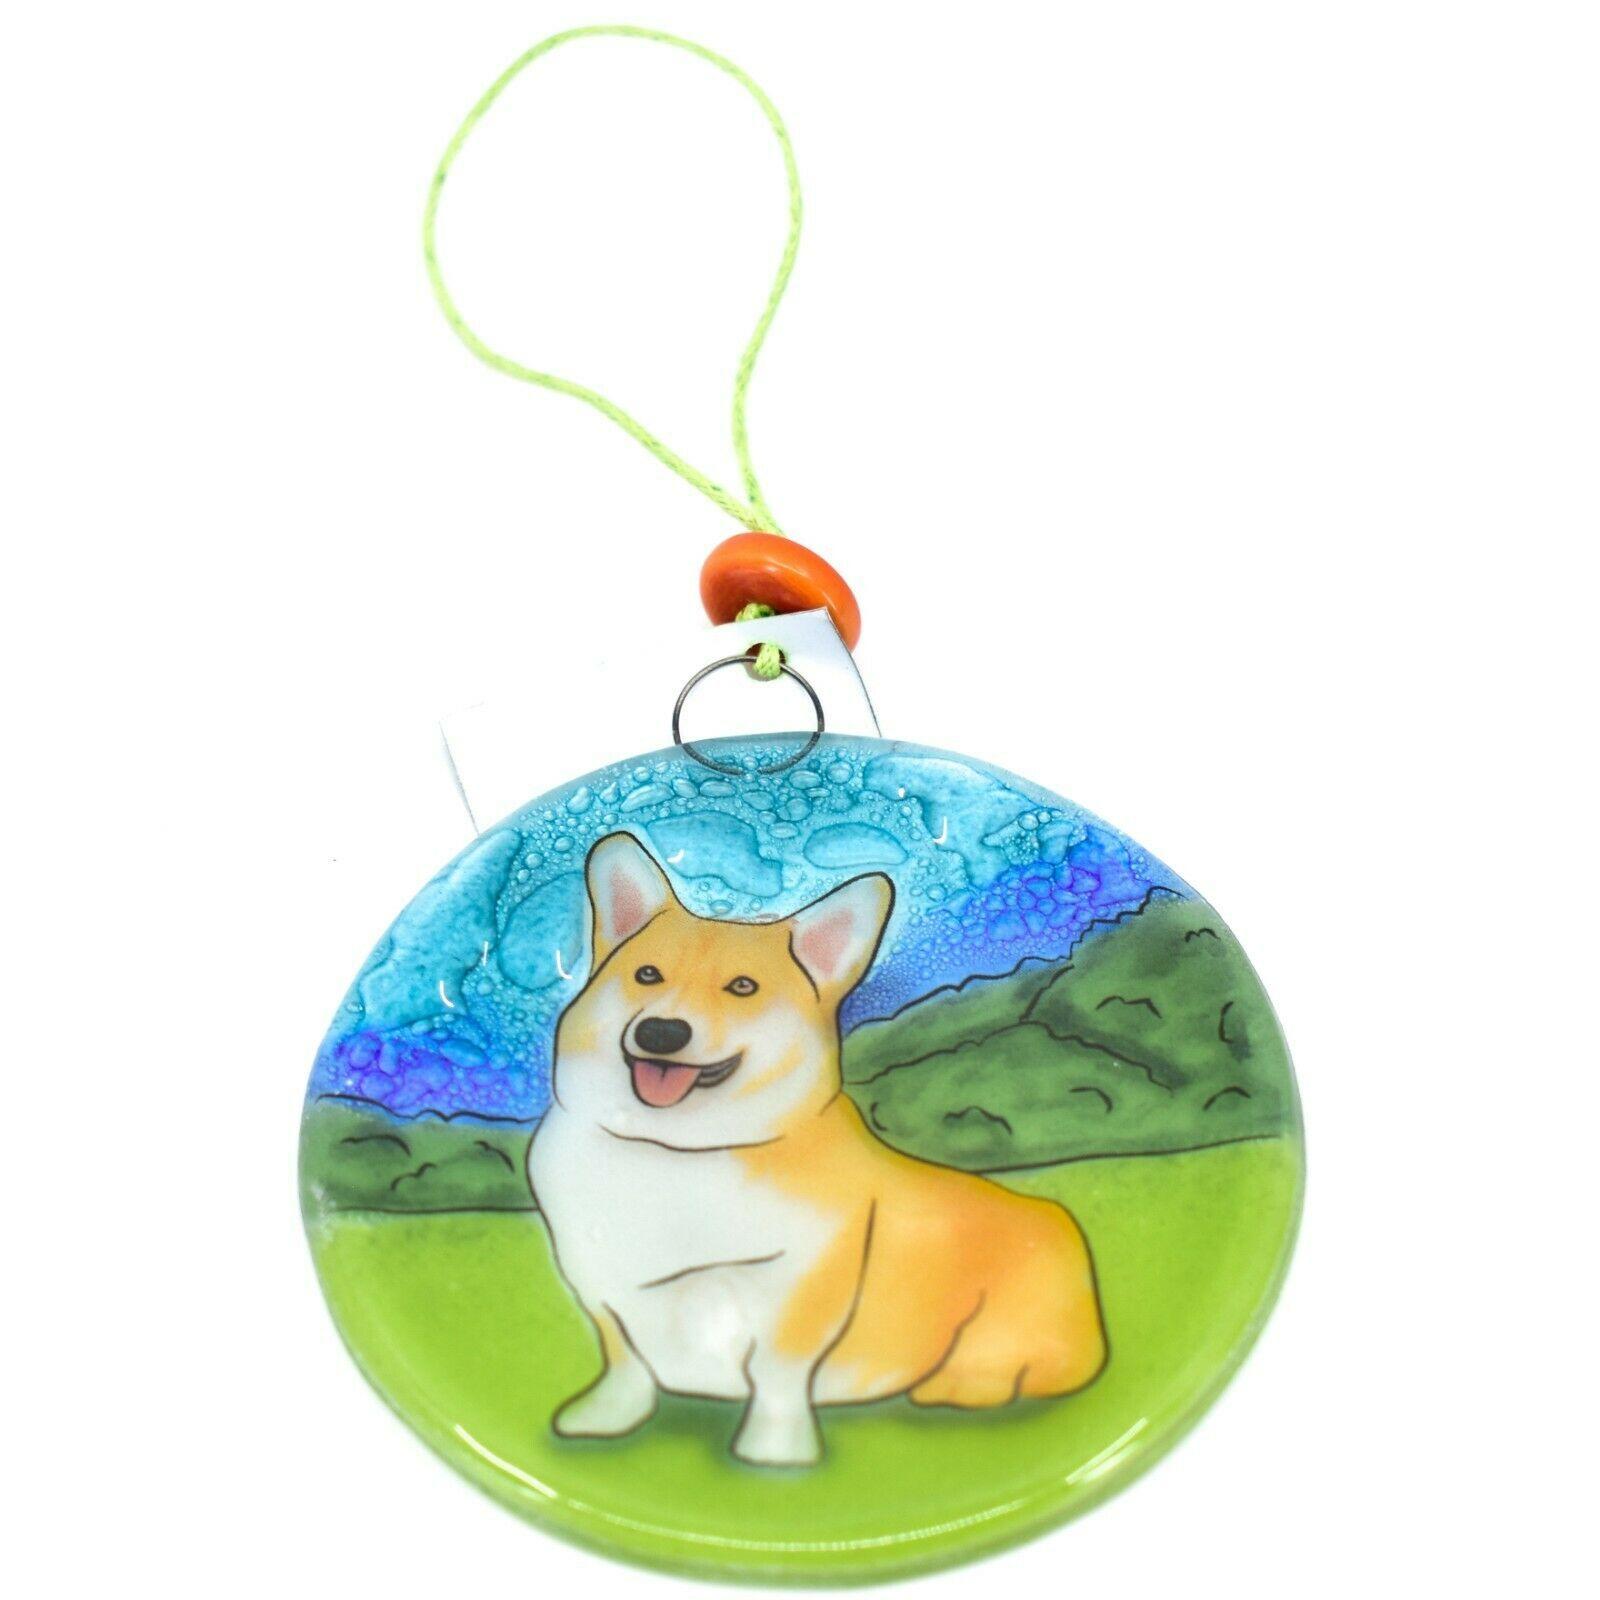 Handmade Fused Art Glass Sitting Smiling Corgi Puppy Ornament Sun Catcher Ecuado